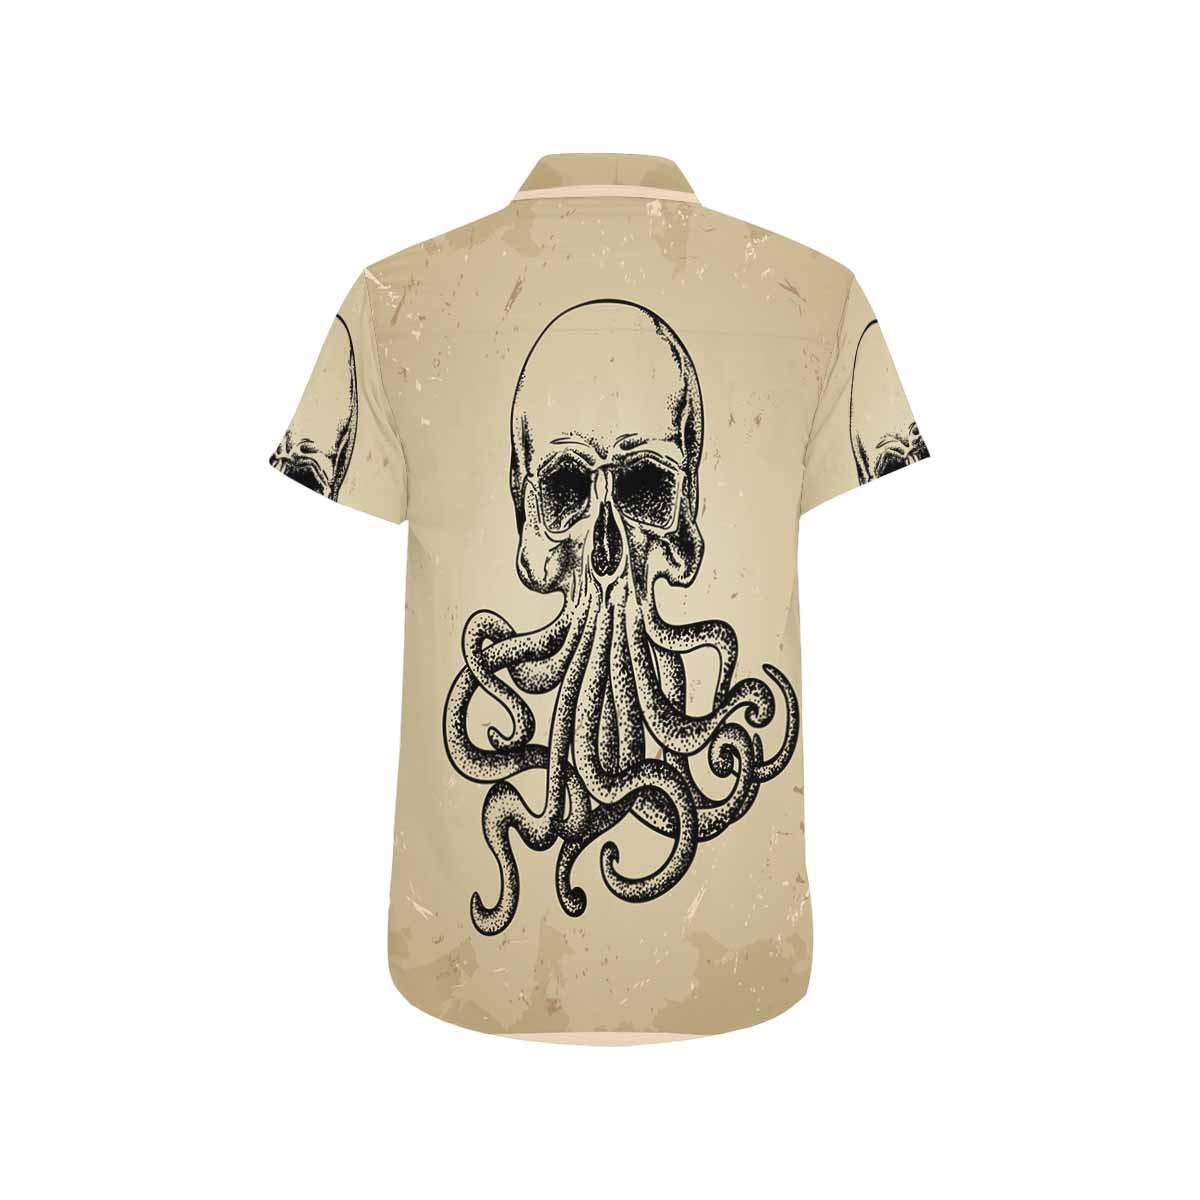 INTERESTPRINT Mens Button Down Skull and Flowers Print Casual Shirt Short Sleeve Shirts